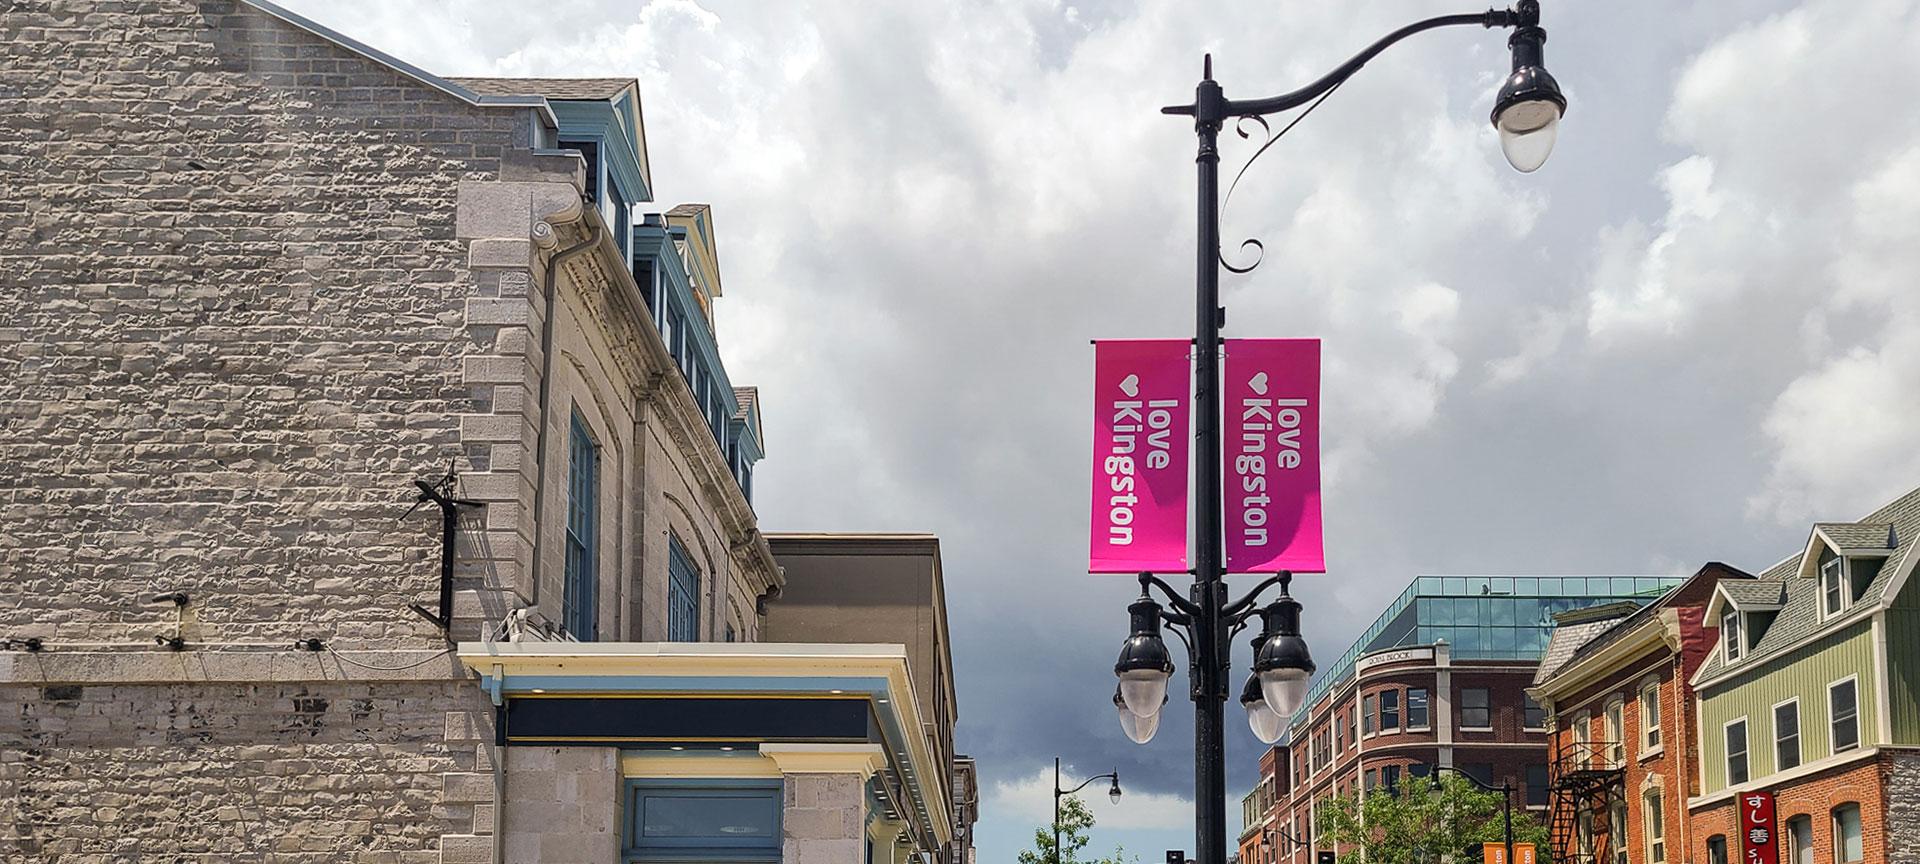 love-kingston-street-banners